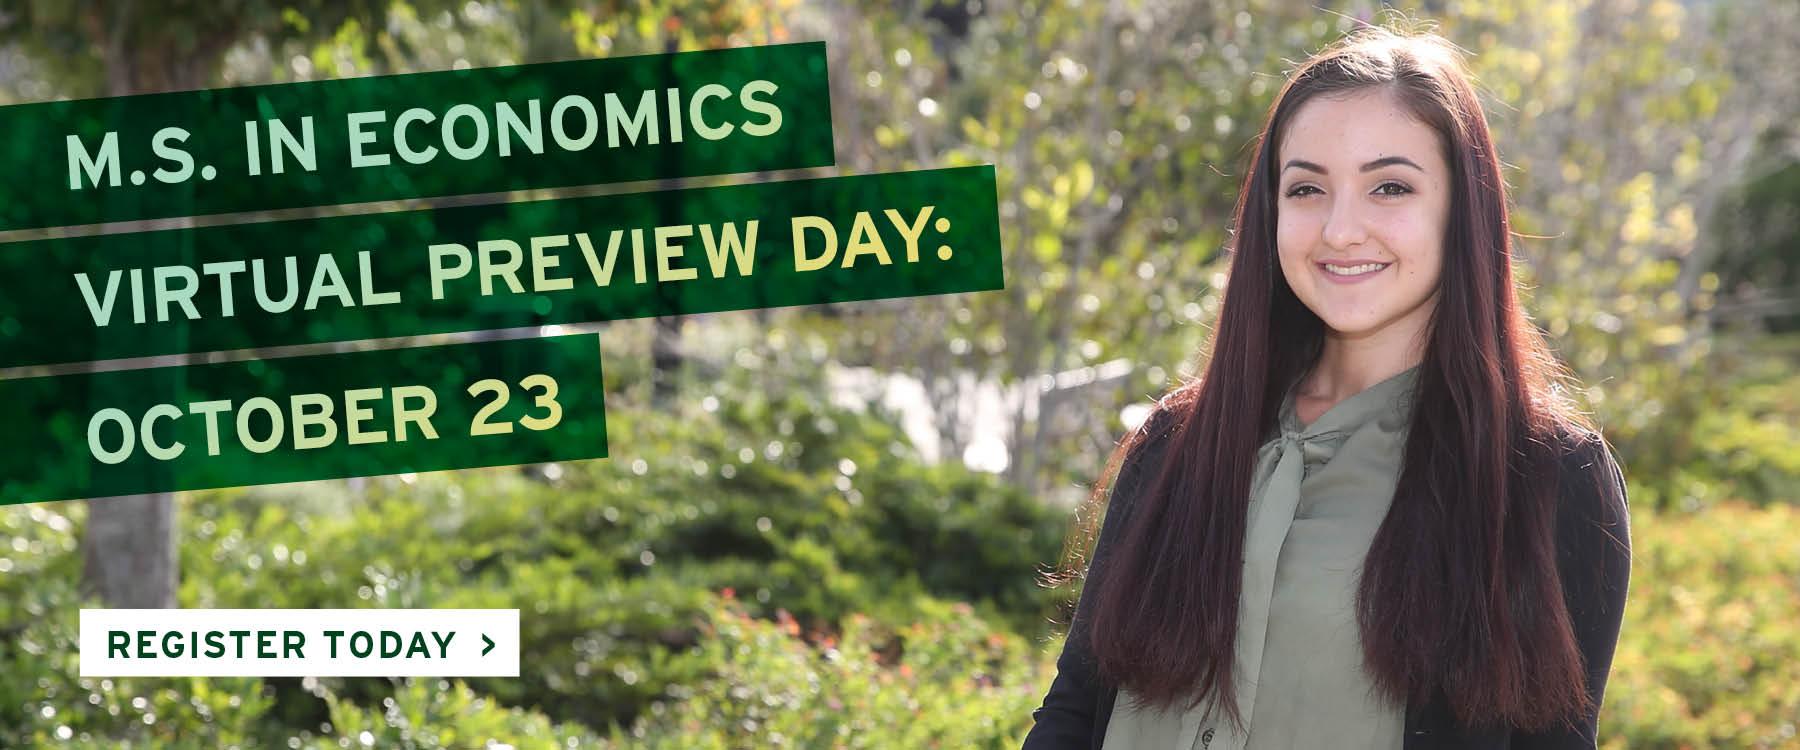 M.S. in Economics Virtual Preview Day